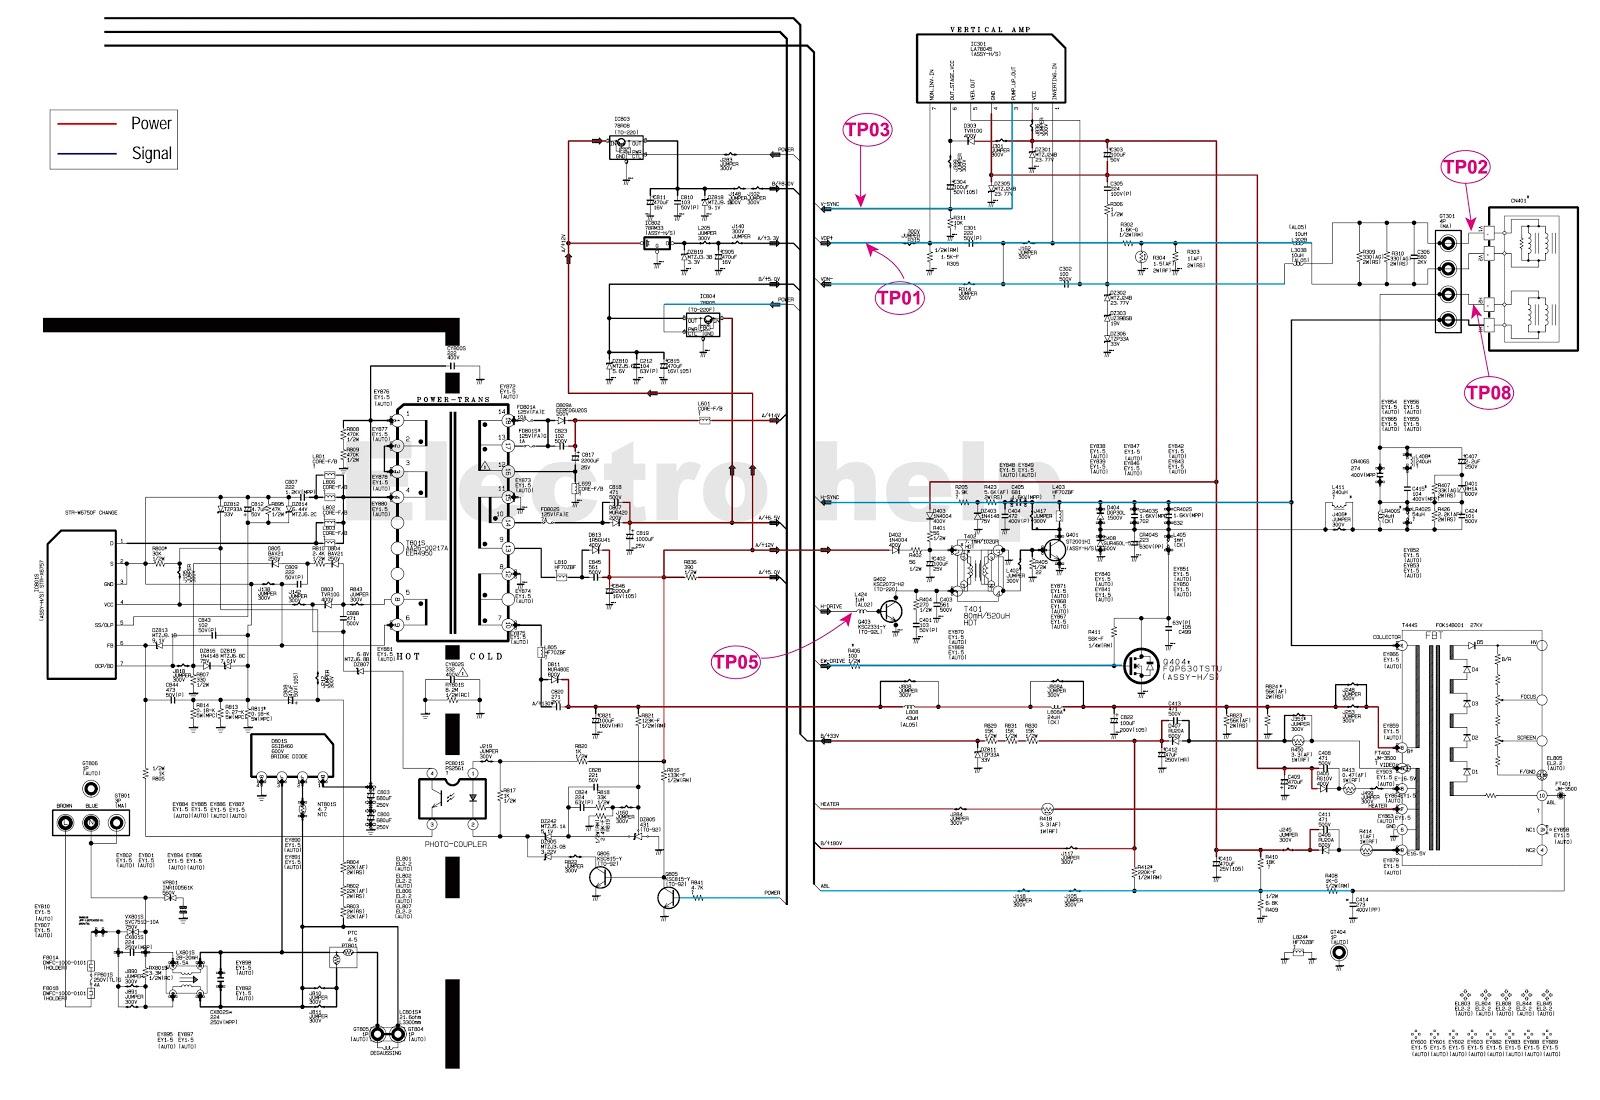 Kx 3523 Samsung Smart Tv Wiring Diagram Free Diagram